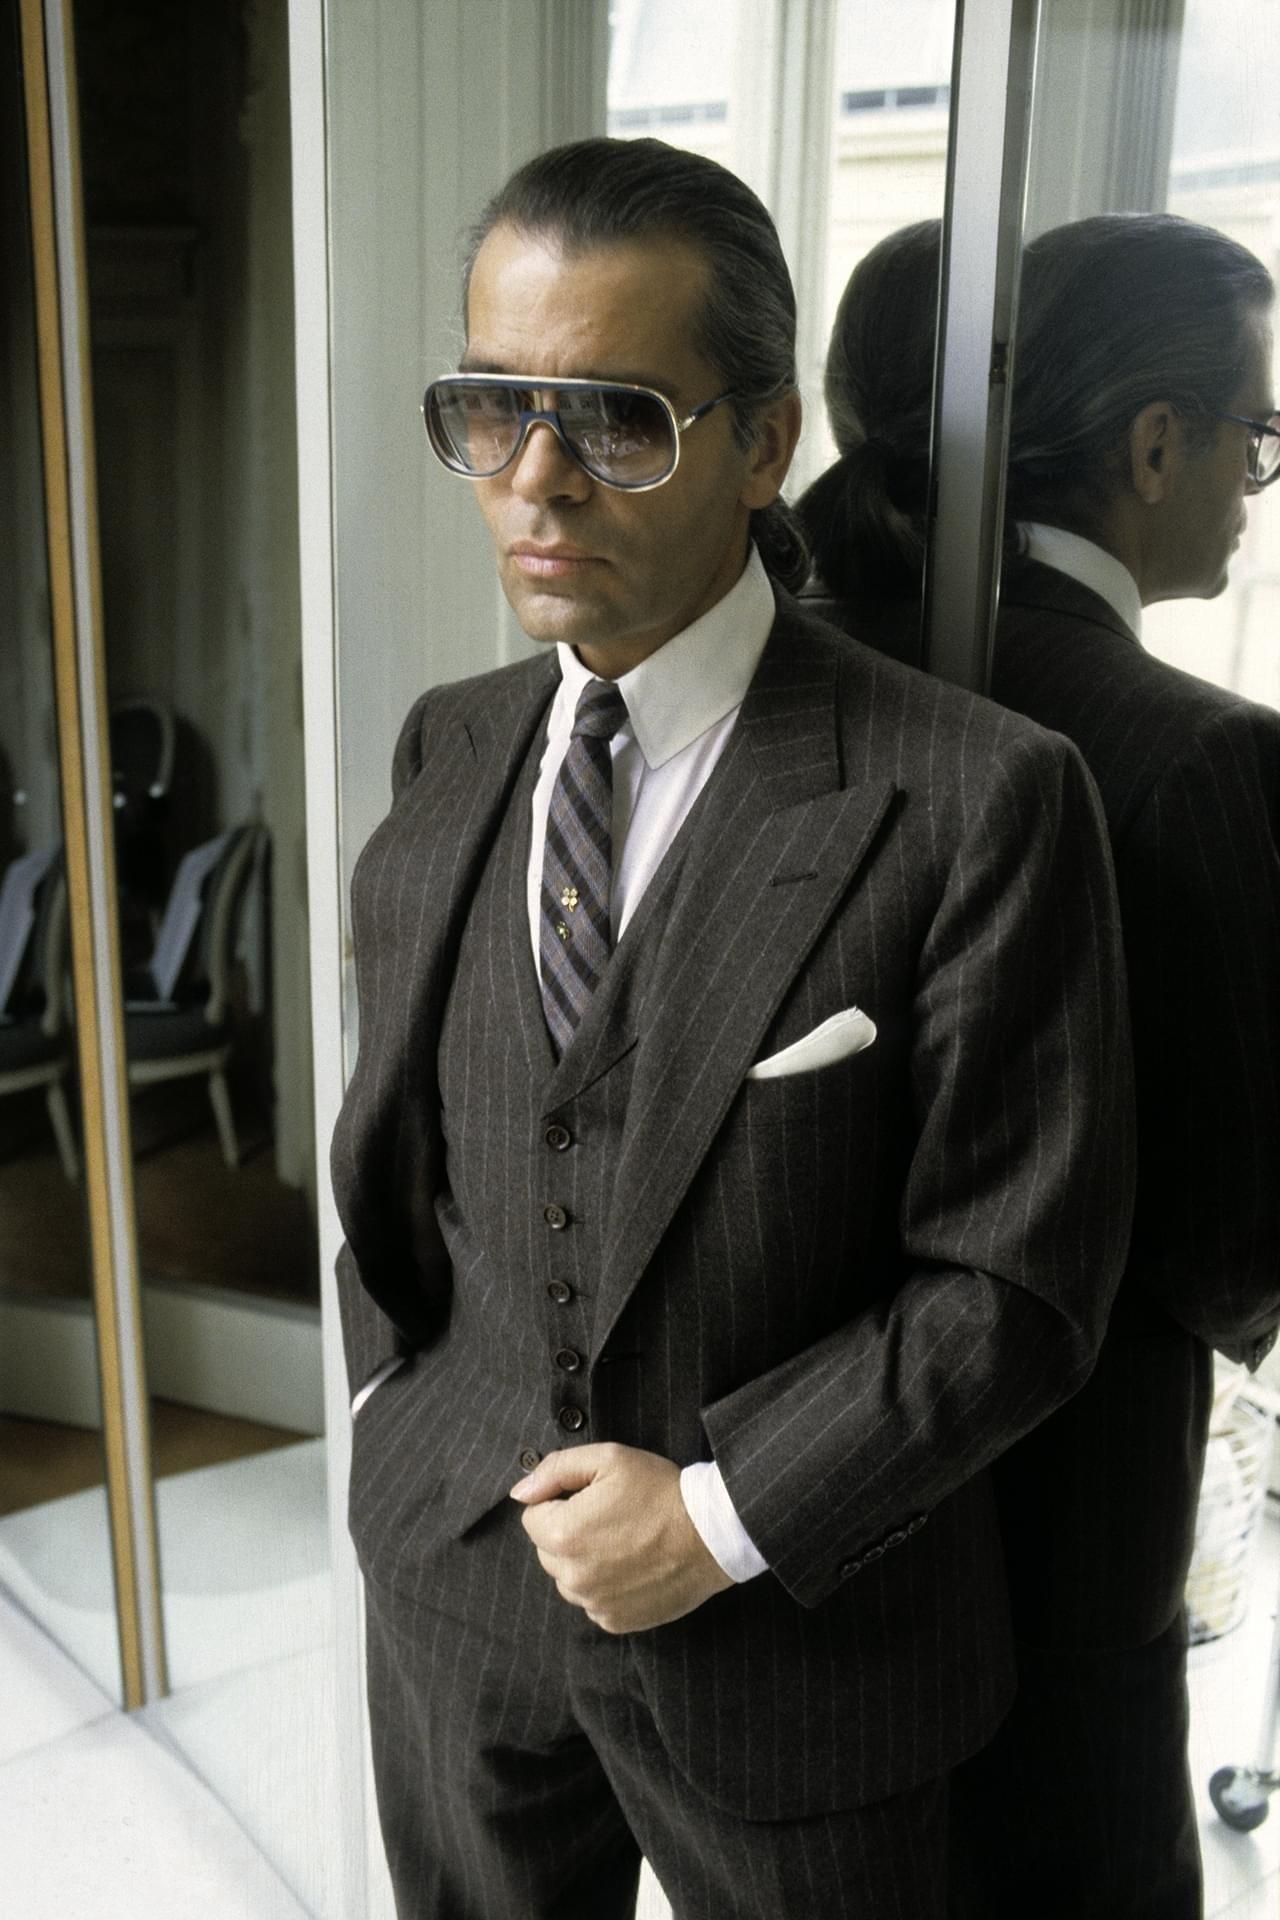 NTK cung Xử Nữ Karl Lagerfeld